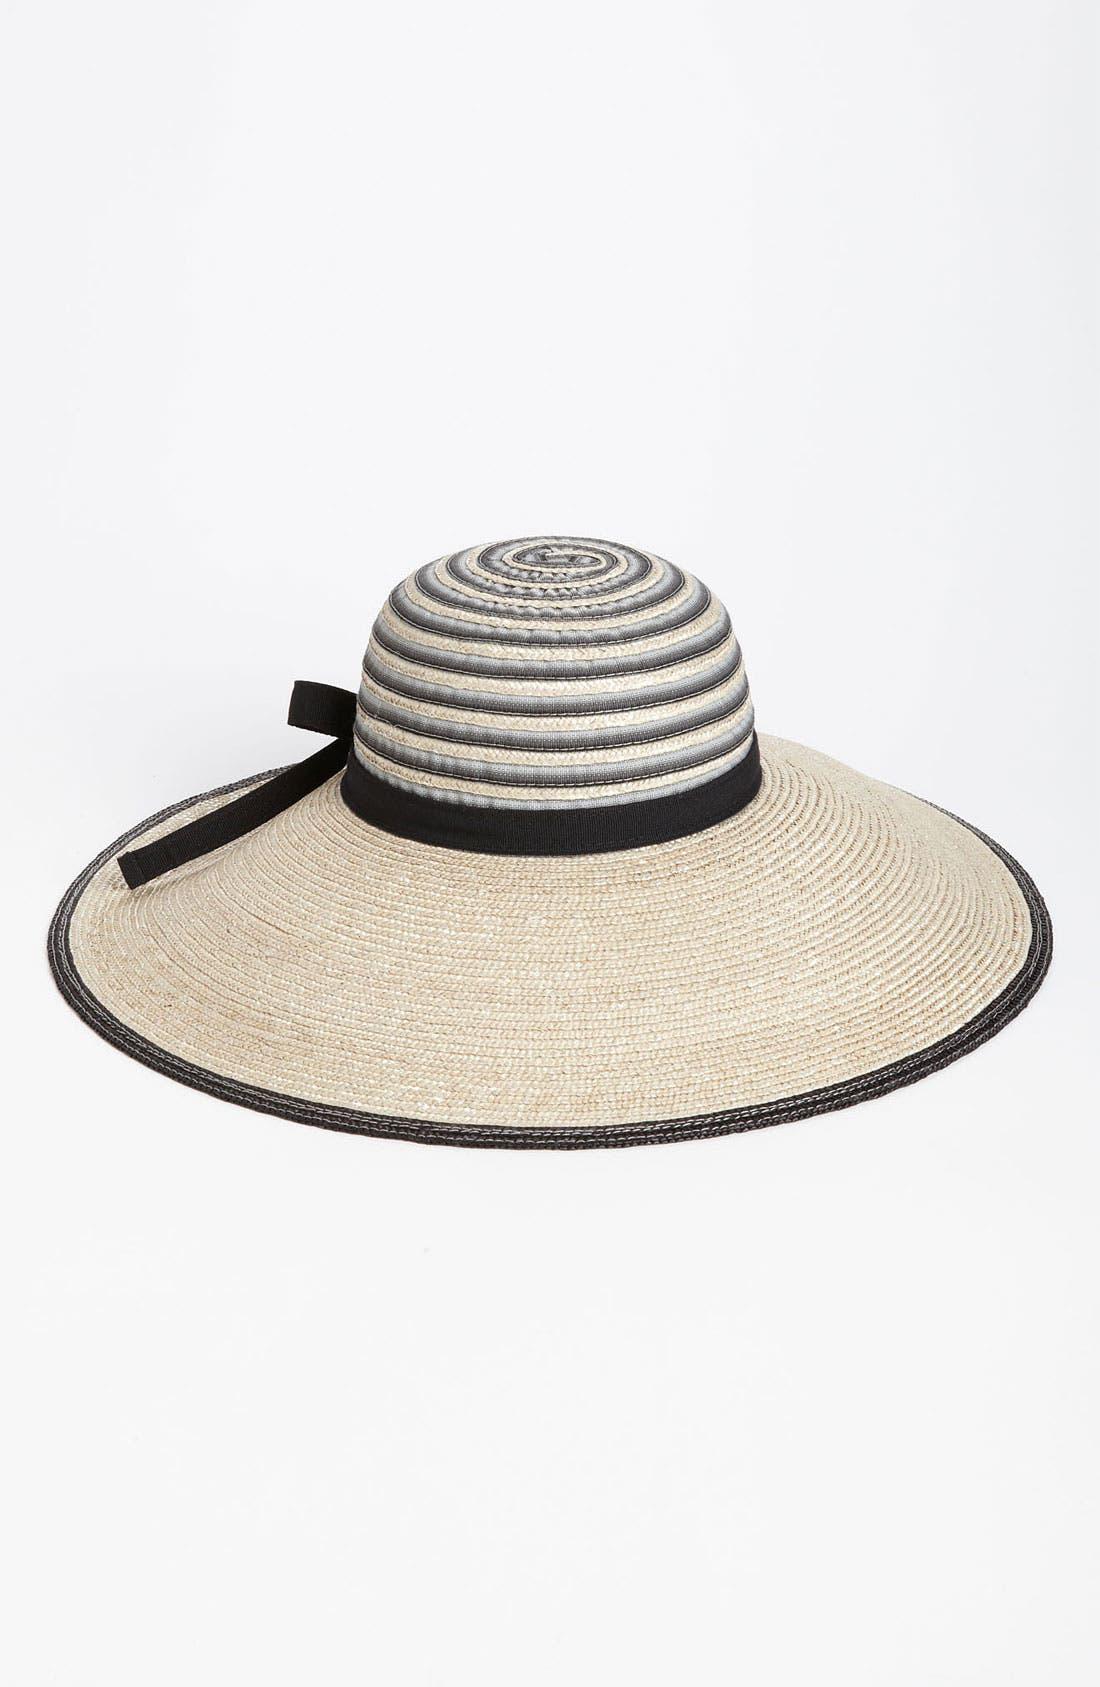 NORDSTROM,                             Dégradé Ribbon Sun Hat,                             Main thumbnail 1, color,                             001